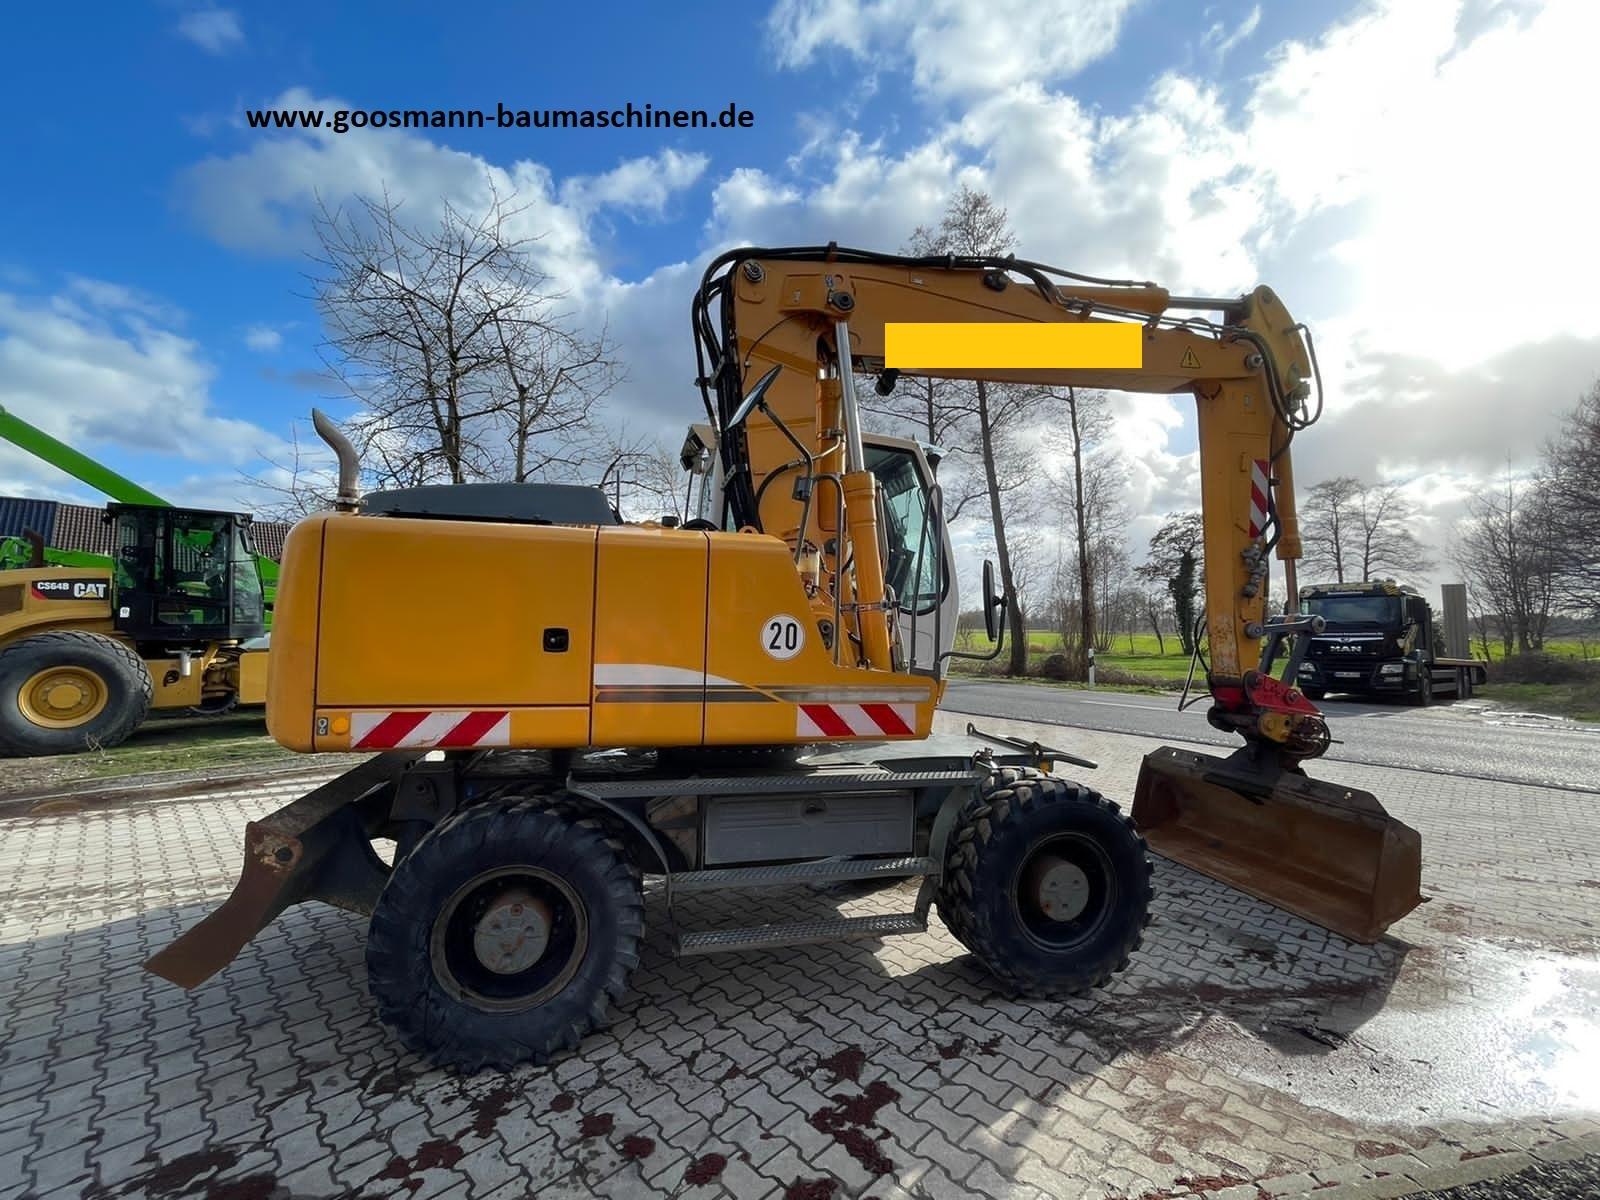 2011-liebherr-a900c-litronic-354018-equipment-cover-image